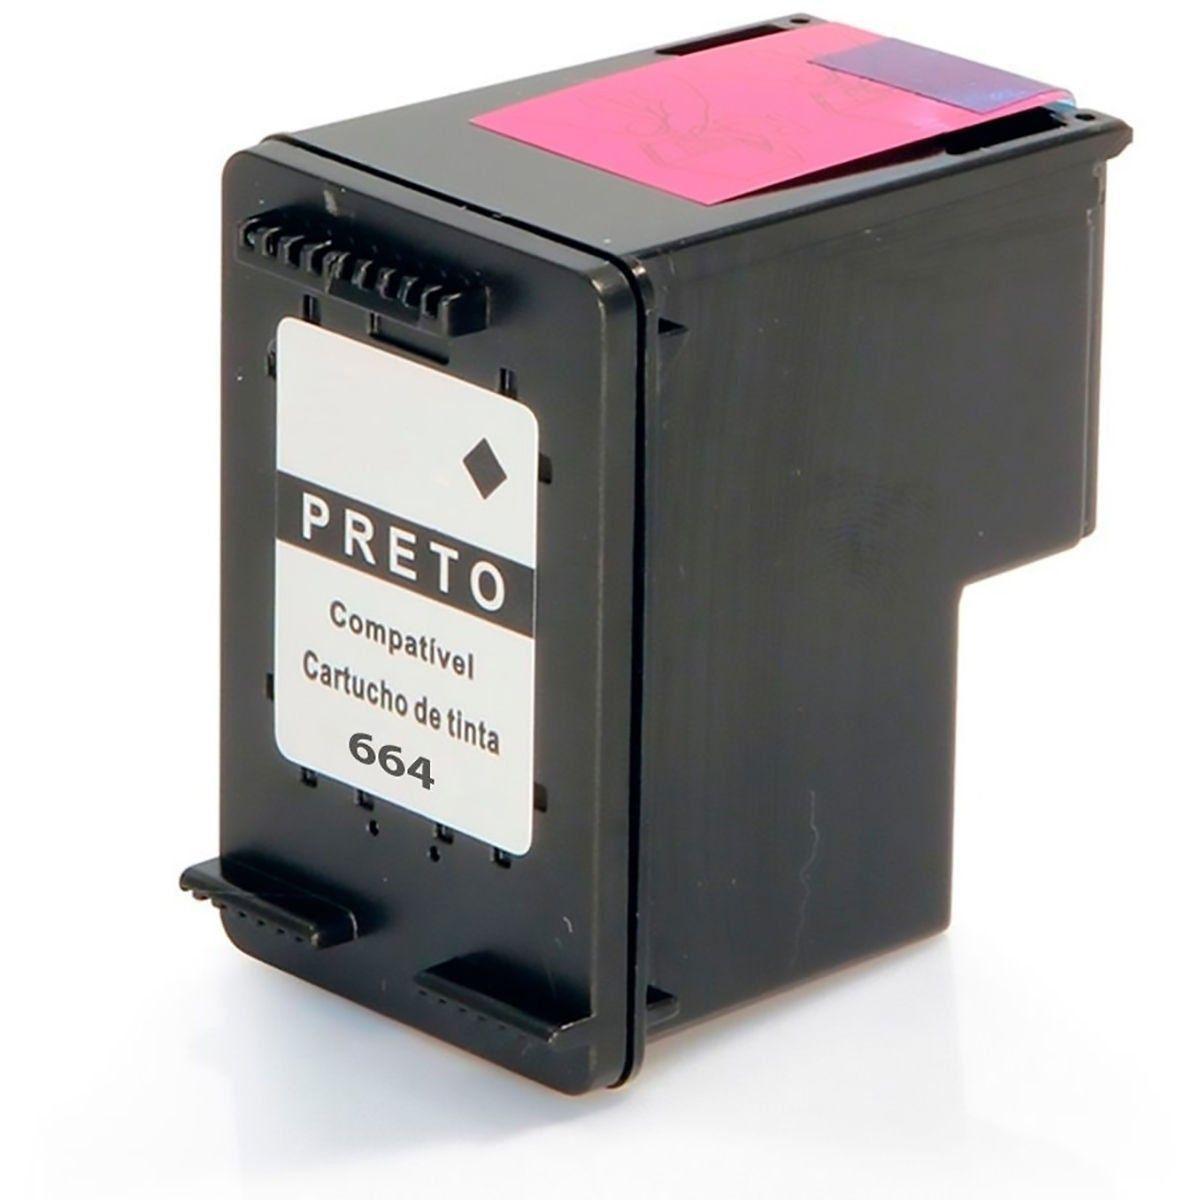 Compatível: Cartucho de Tinta 664xl 664 para Impressora HP 1115 F5S21a 2136 F5S30a 3636 3836 4536 / Preto / 14ml